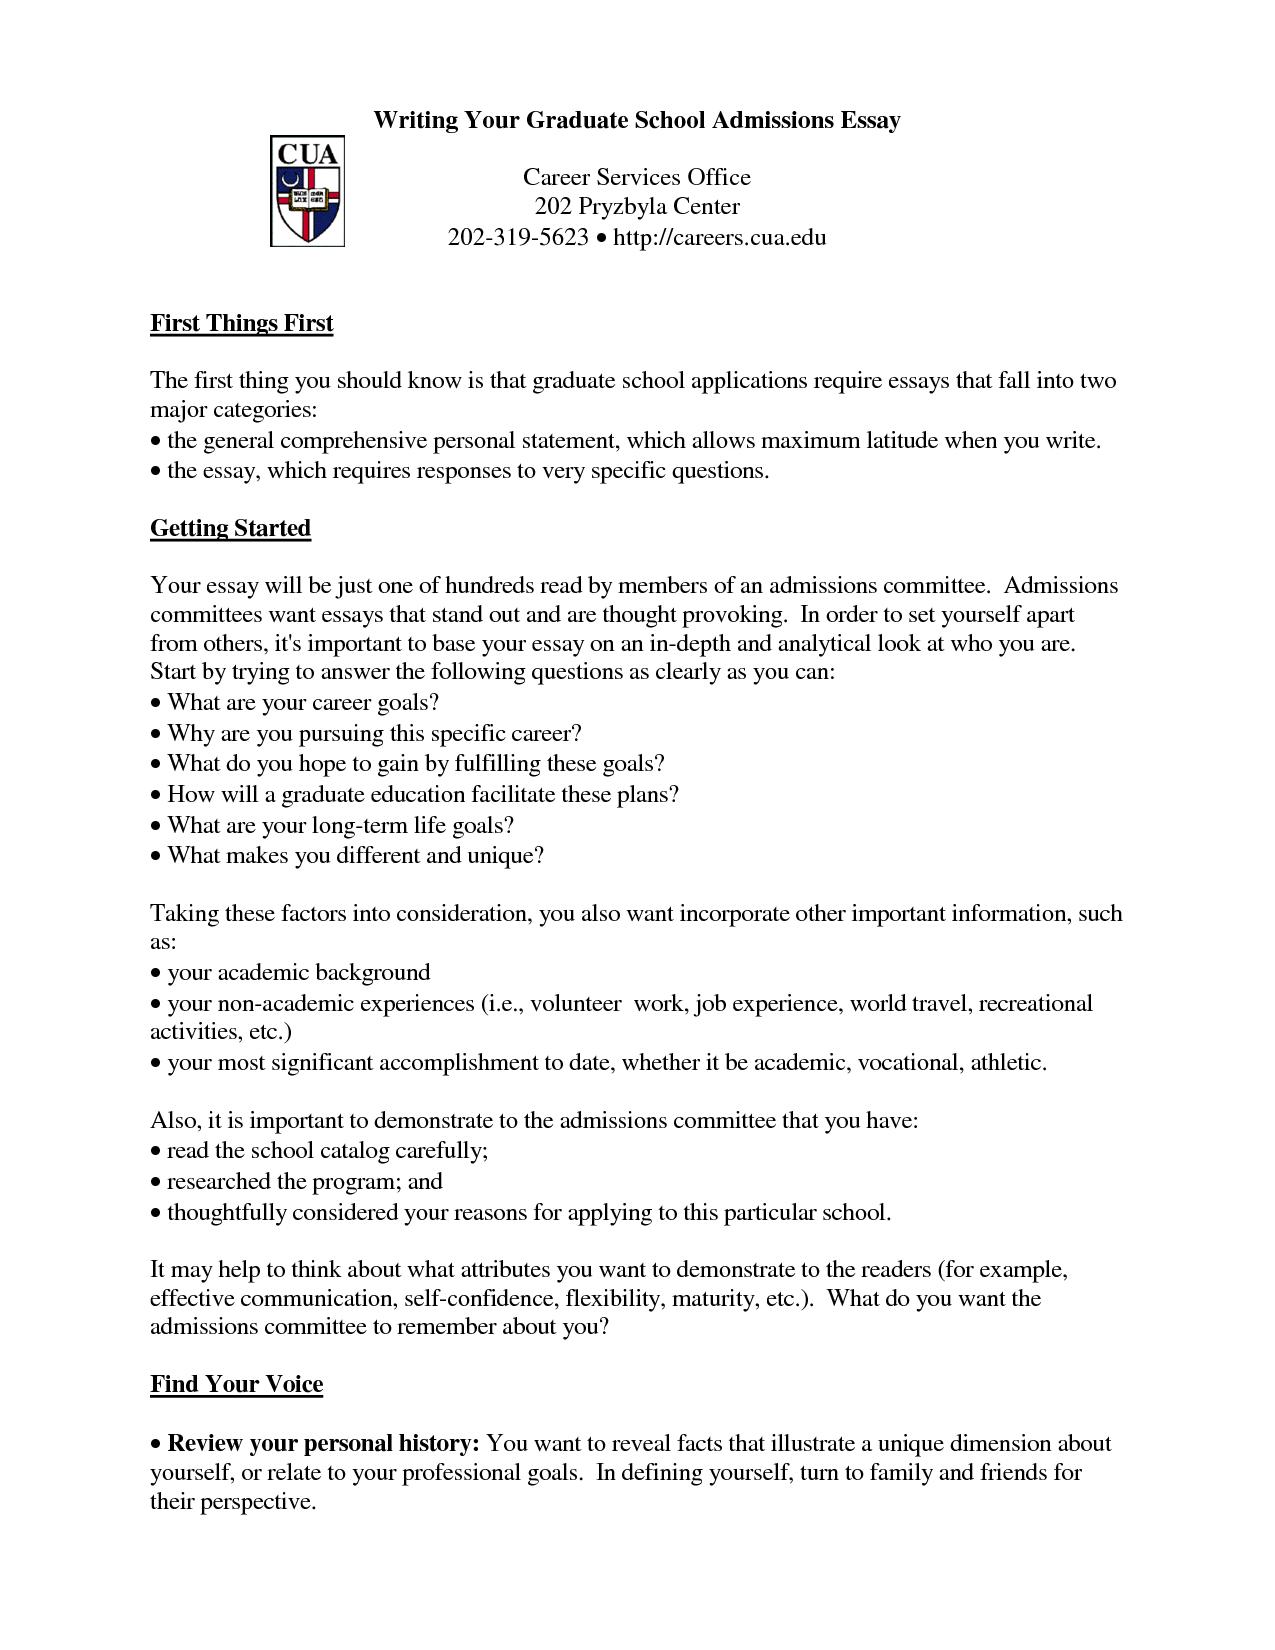 002 Essay Example Free Sample For Graduate School Admission Formidable Pdf Full